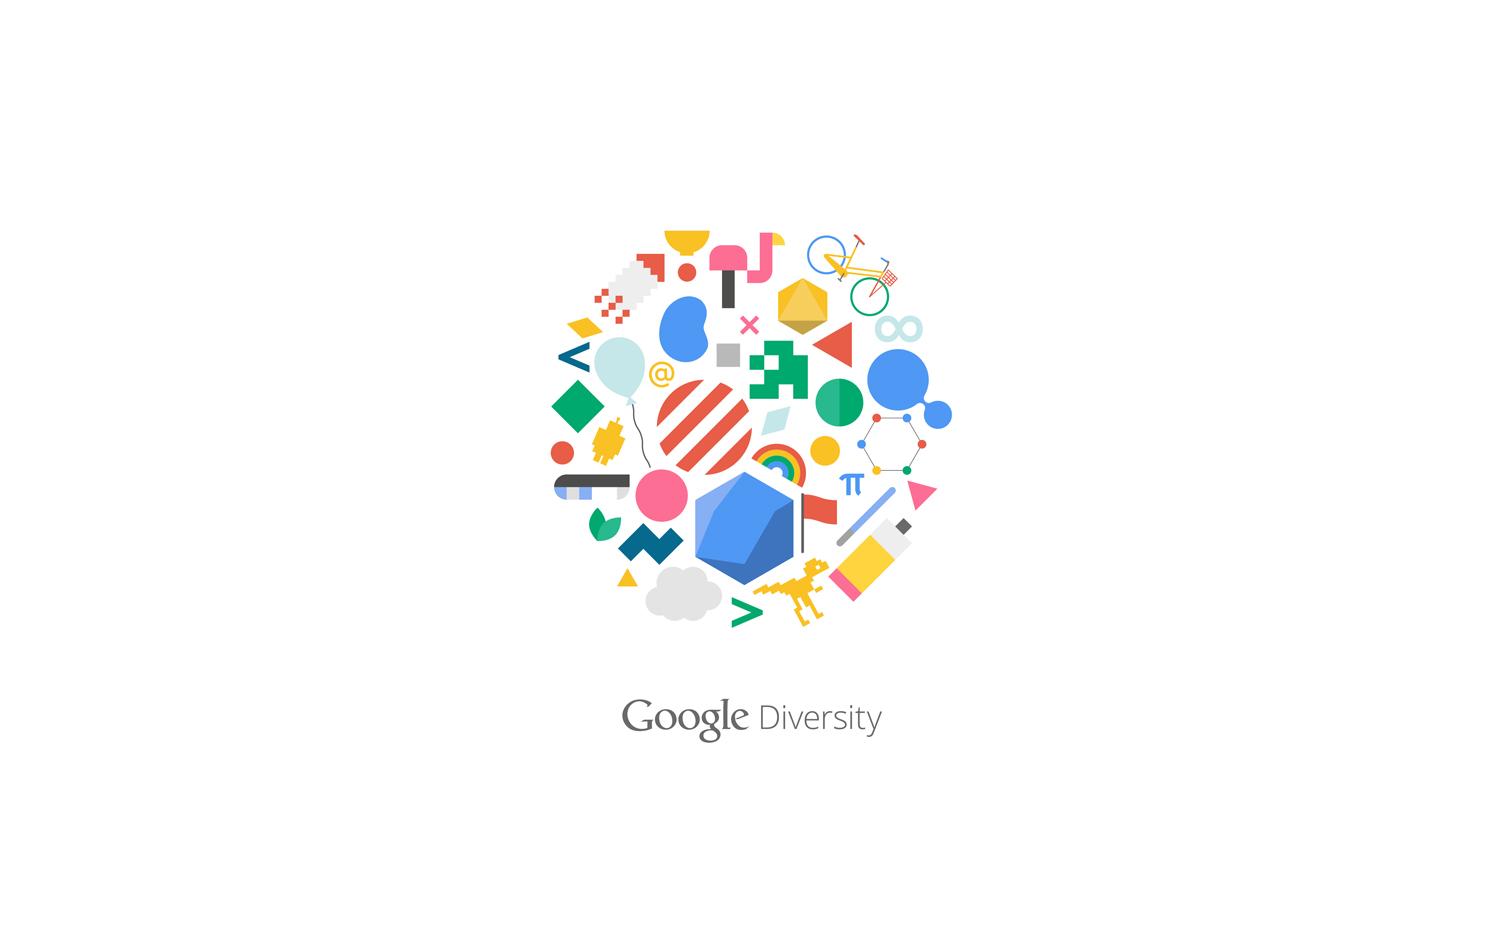 mchiao_google_diversity_010.jpg